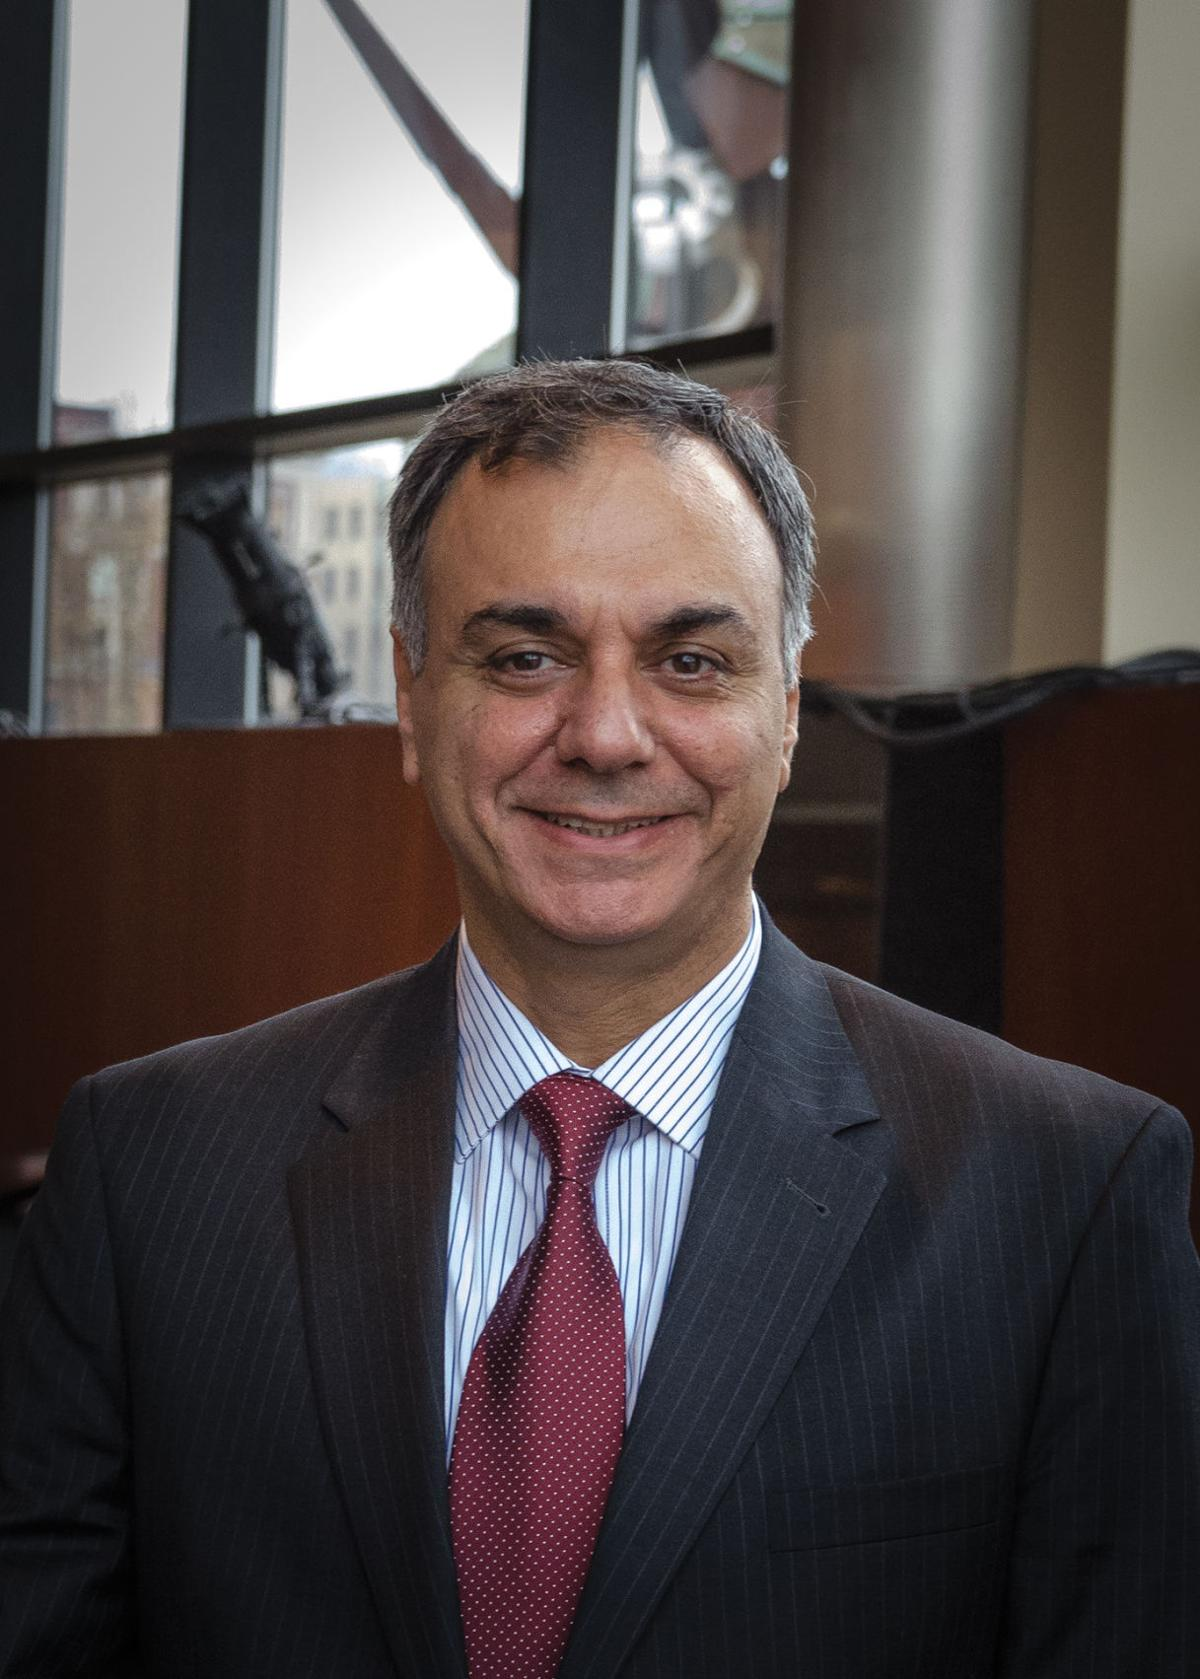 Clay Center CEO Al Najjar